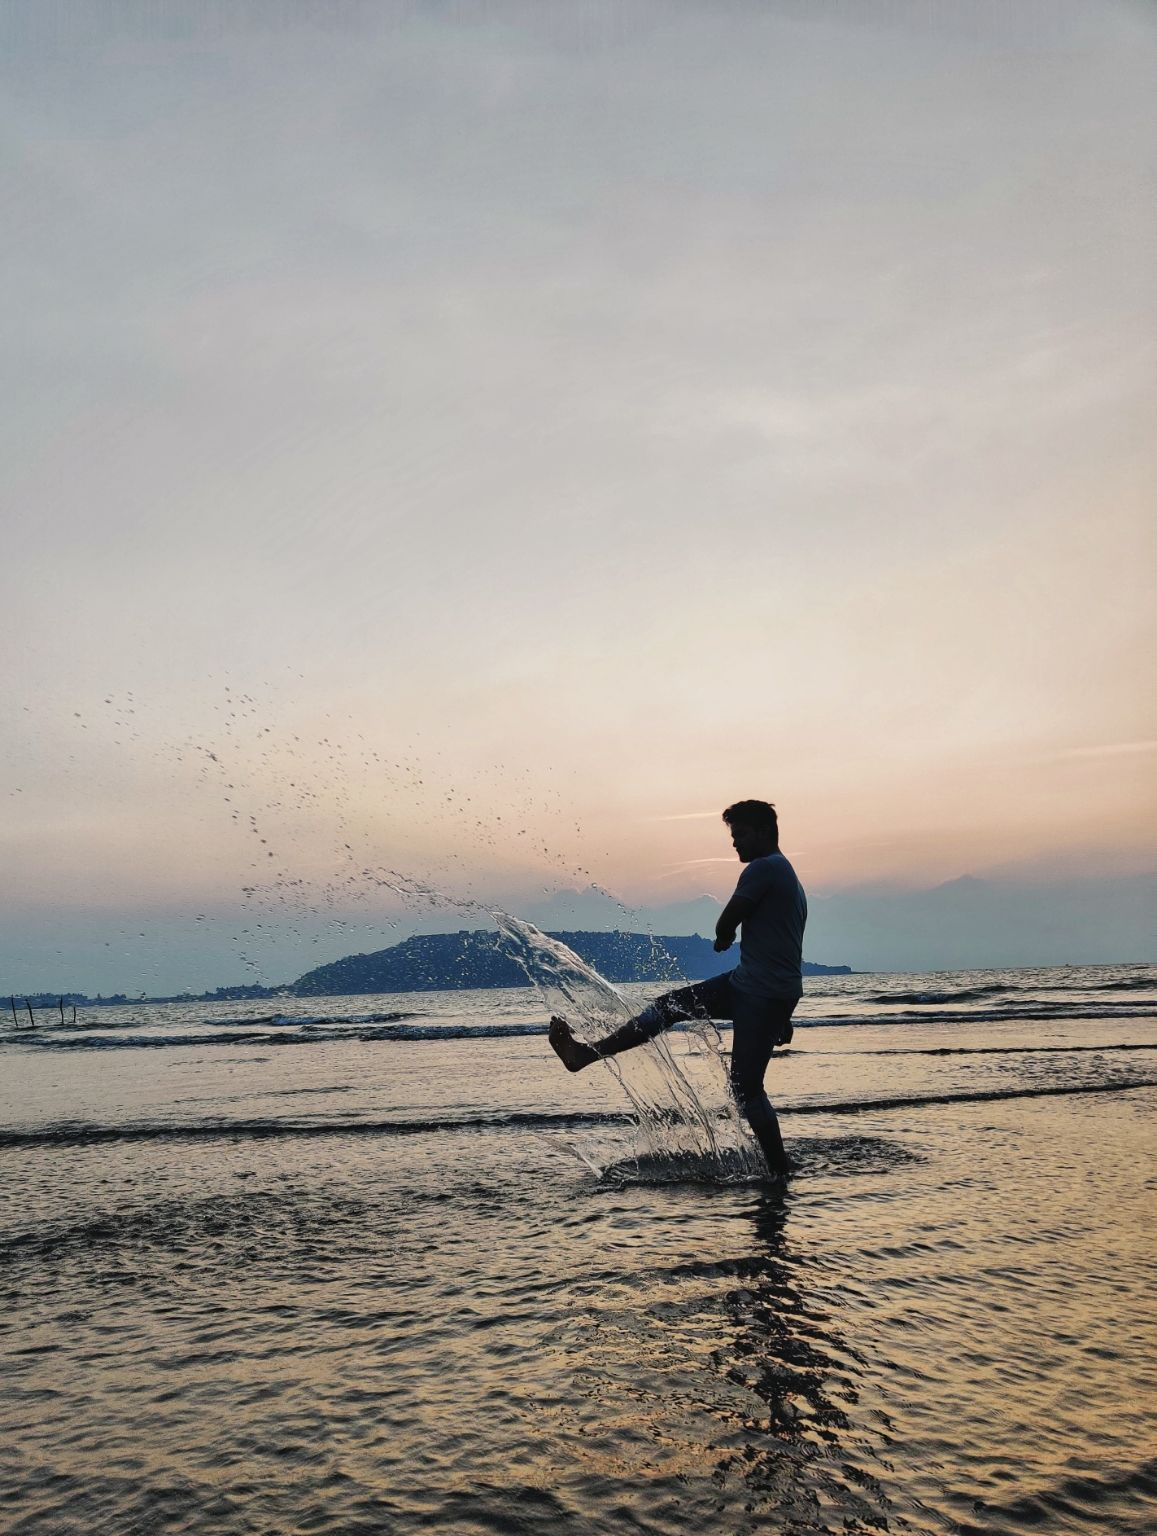 Photo of Revdanda Beach By Shubhangee Vyas